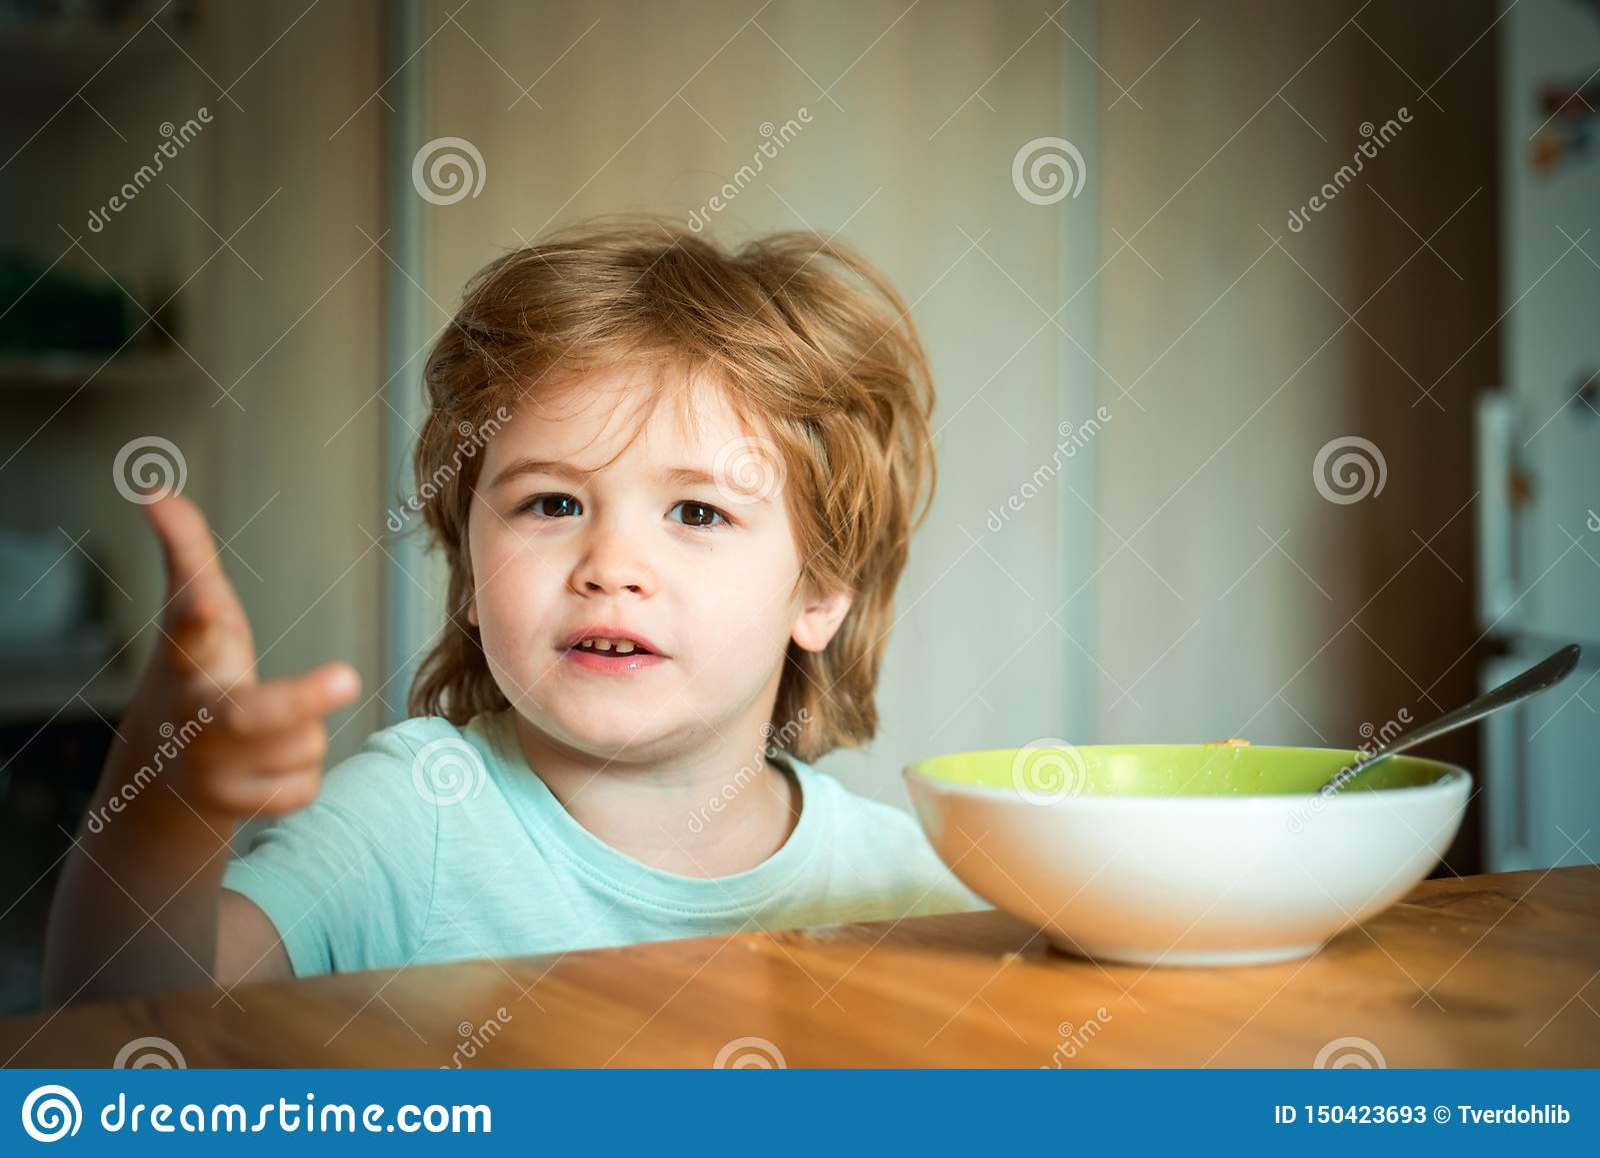 E Τρόφιμα και ποτό για το παιδί Λίγο μωρό τρώει Καλημέρα στην ευτυχή οικογένεια childcare Θερινό δελτίο τροφίμων